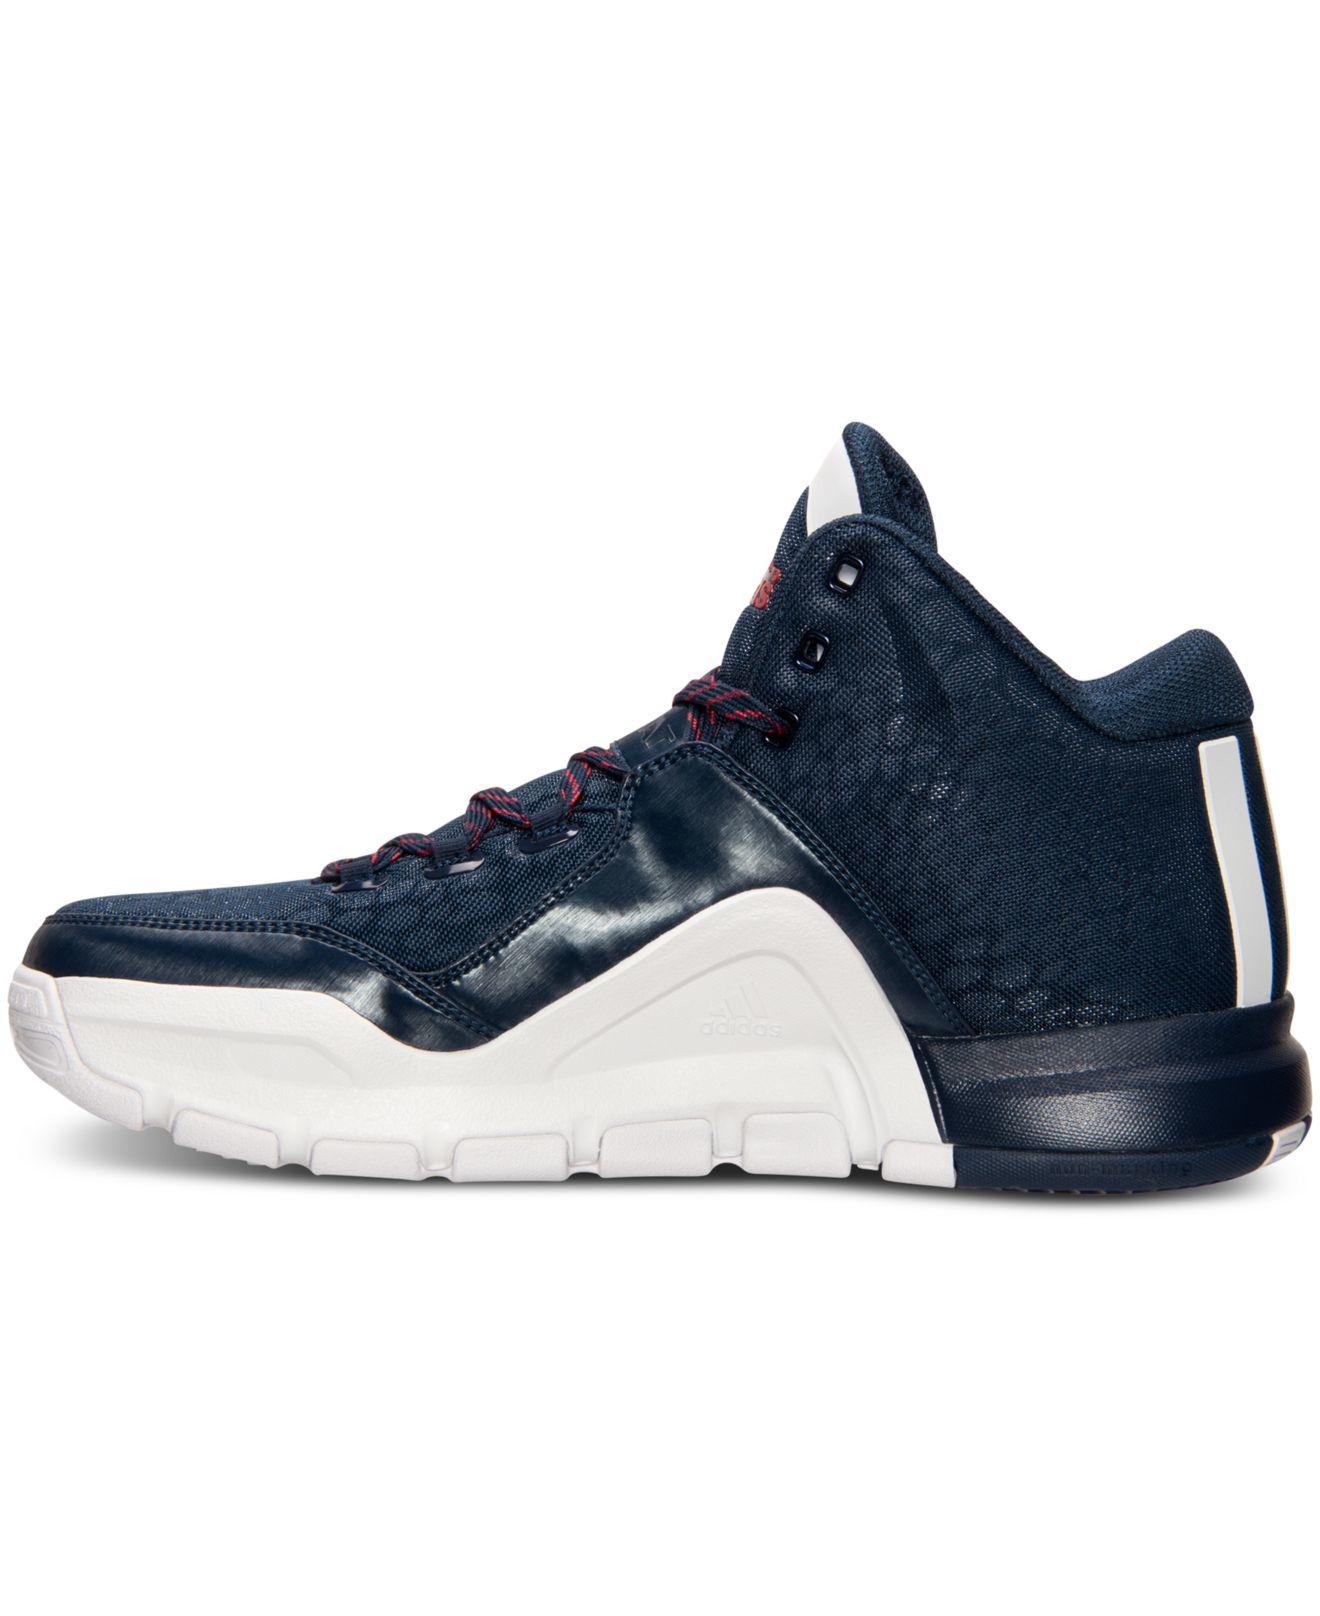 lyst adidas uomini j wall 2 scarpe da basket traguardo in